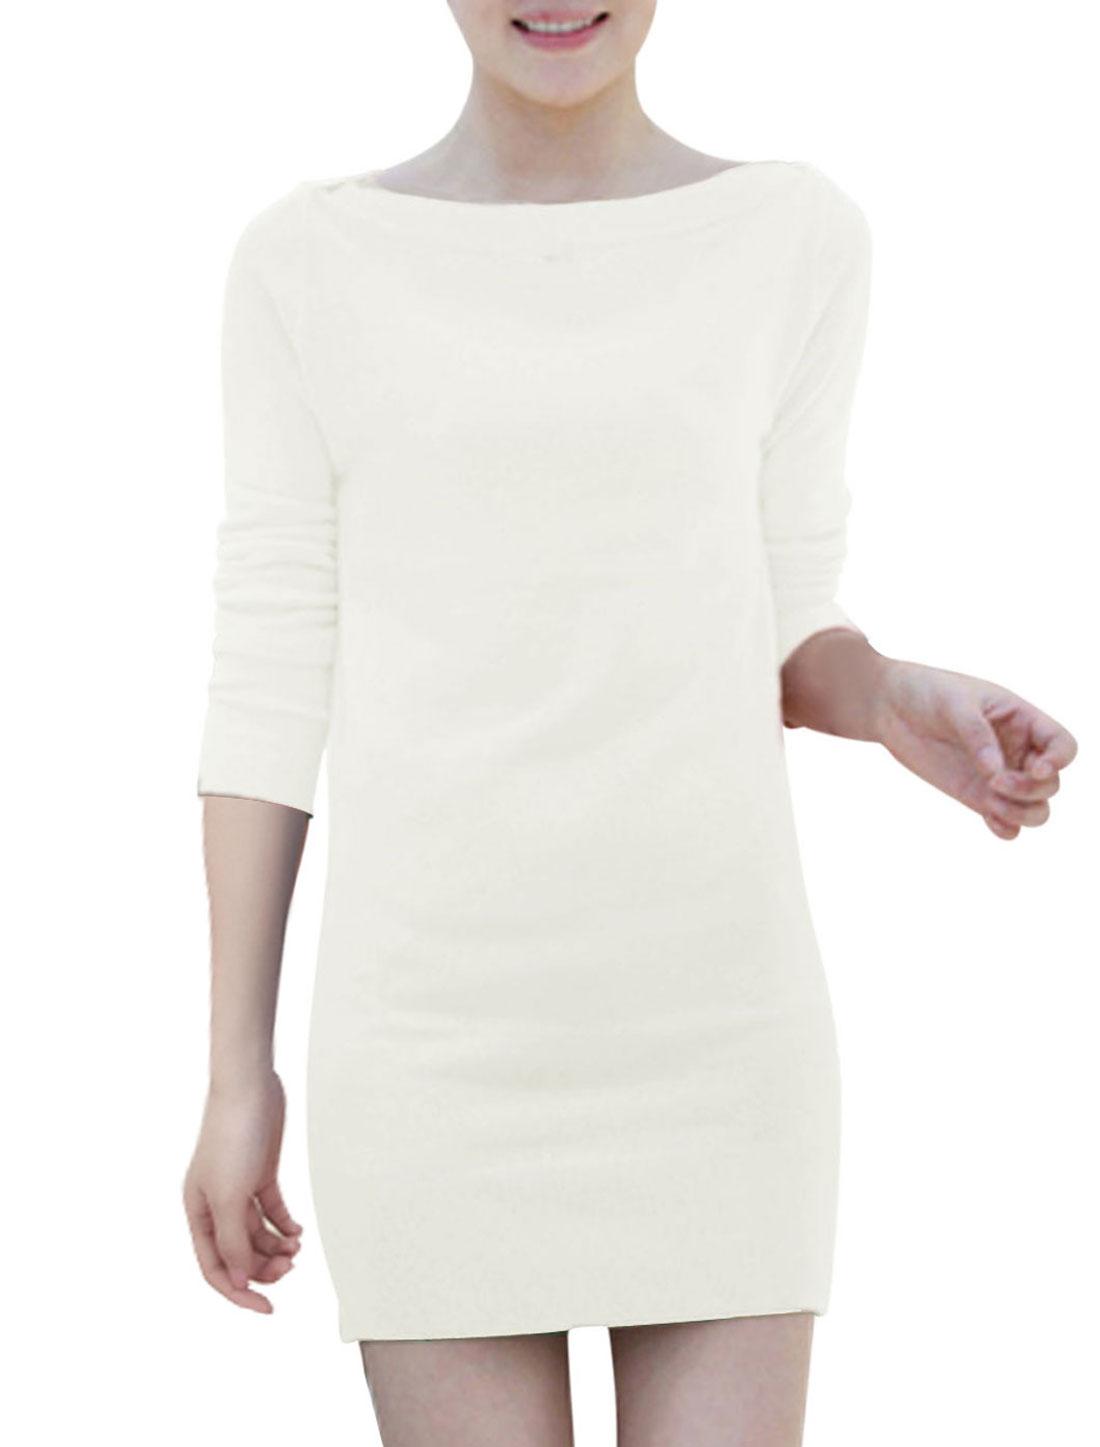 Long Sleeves Two Ways Wearing Trendy Knit Sheath Dress for Women White S